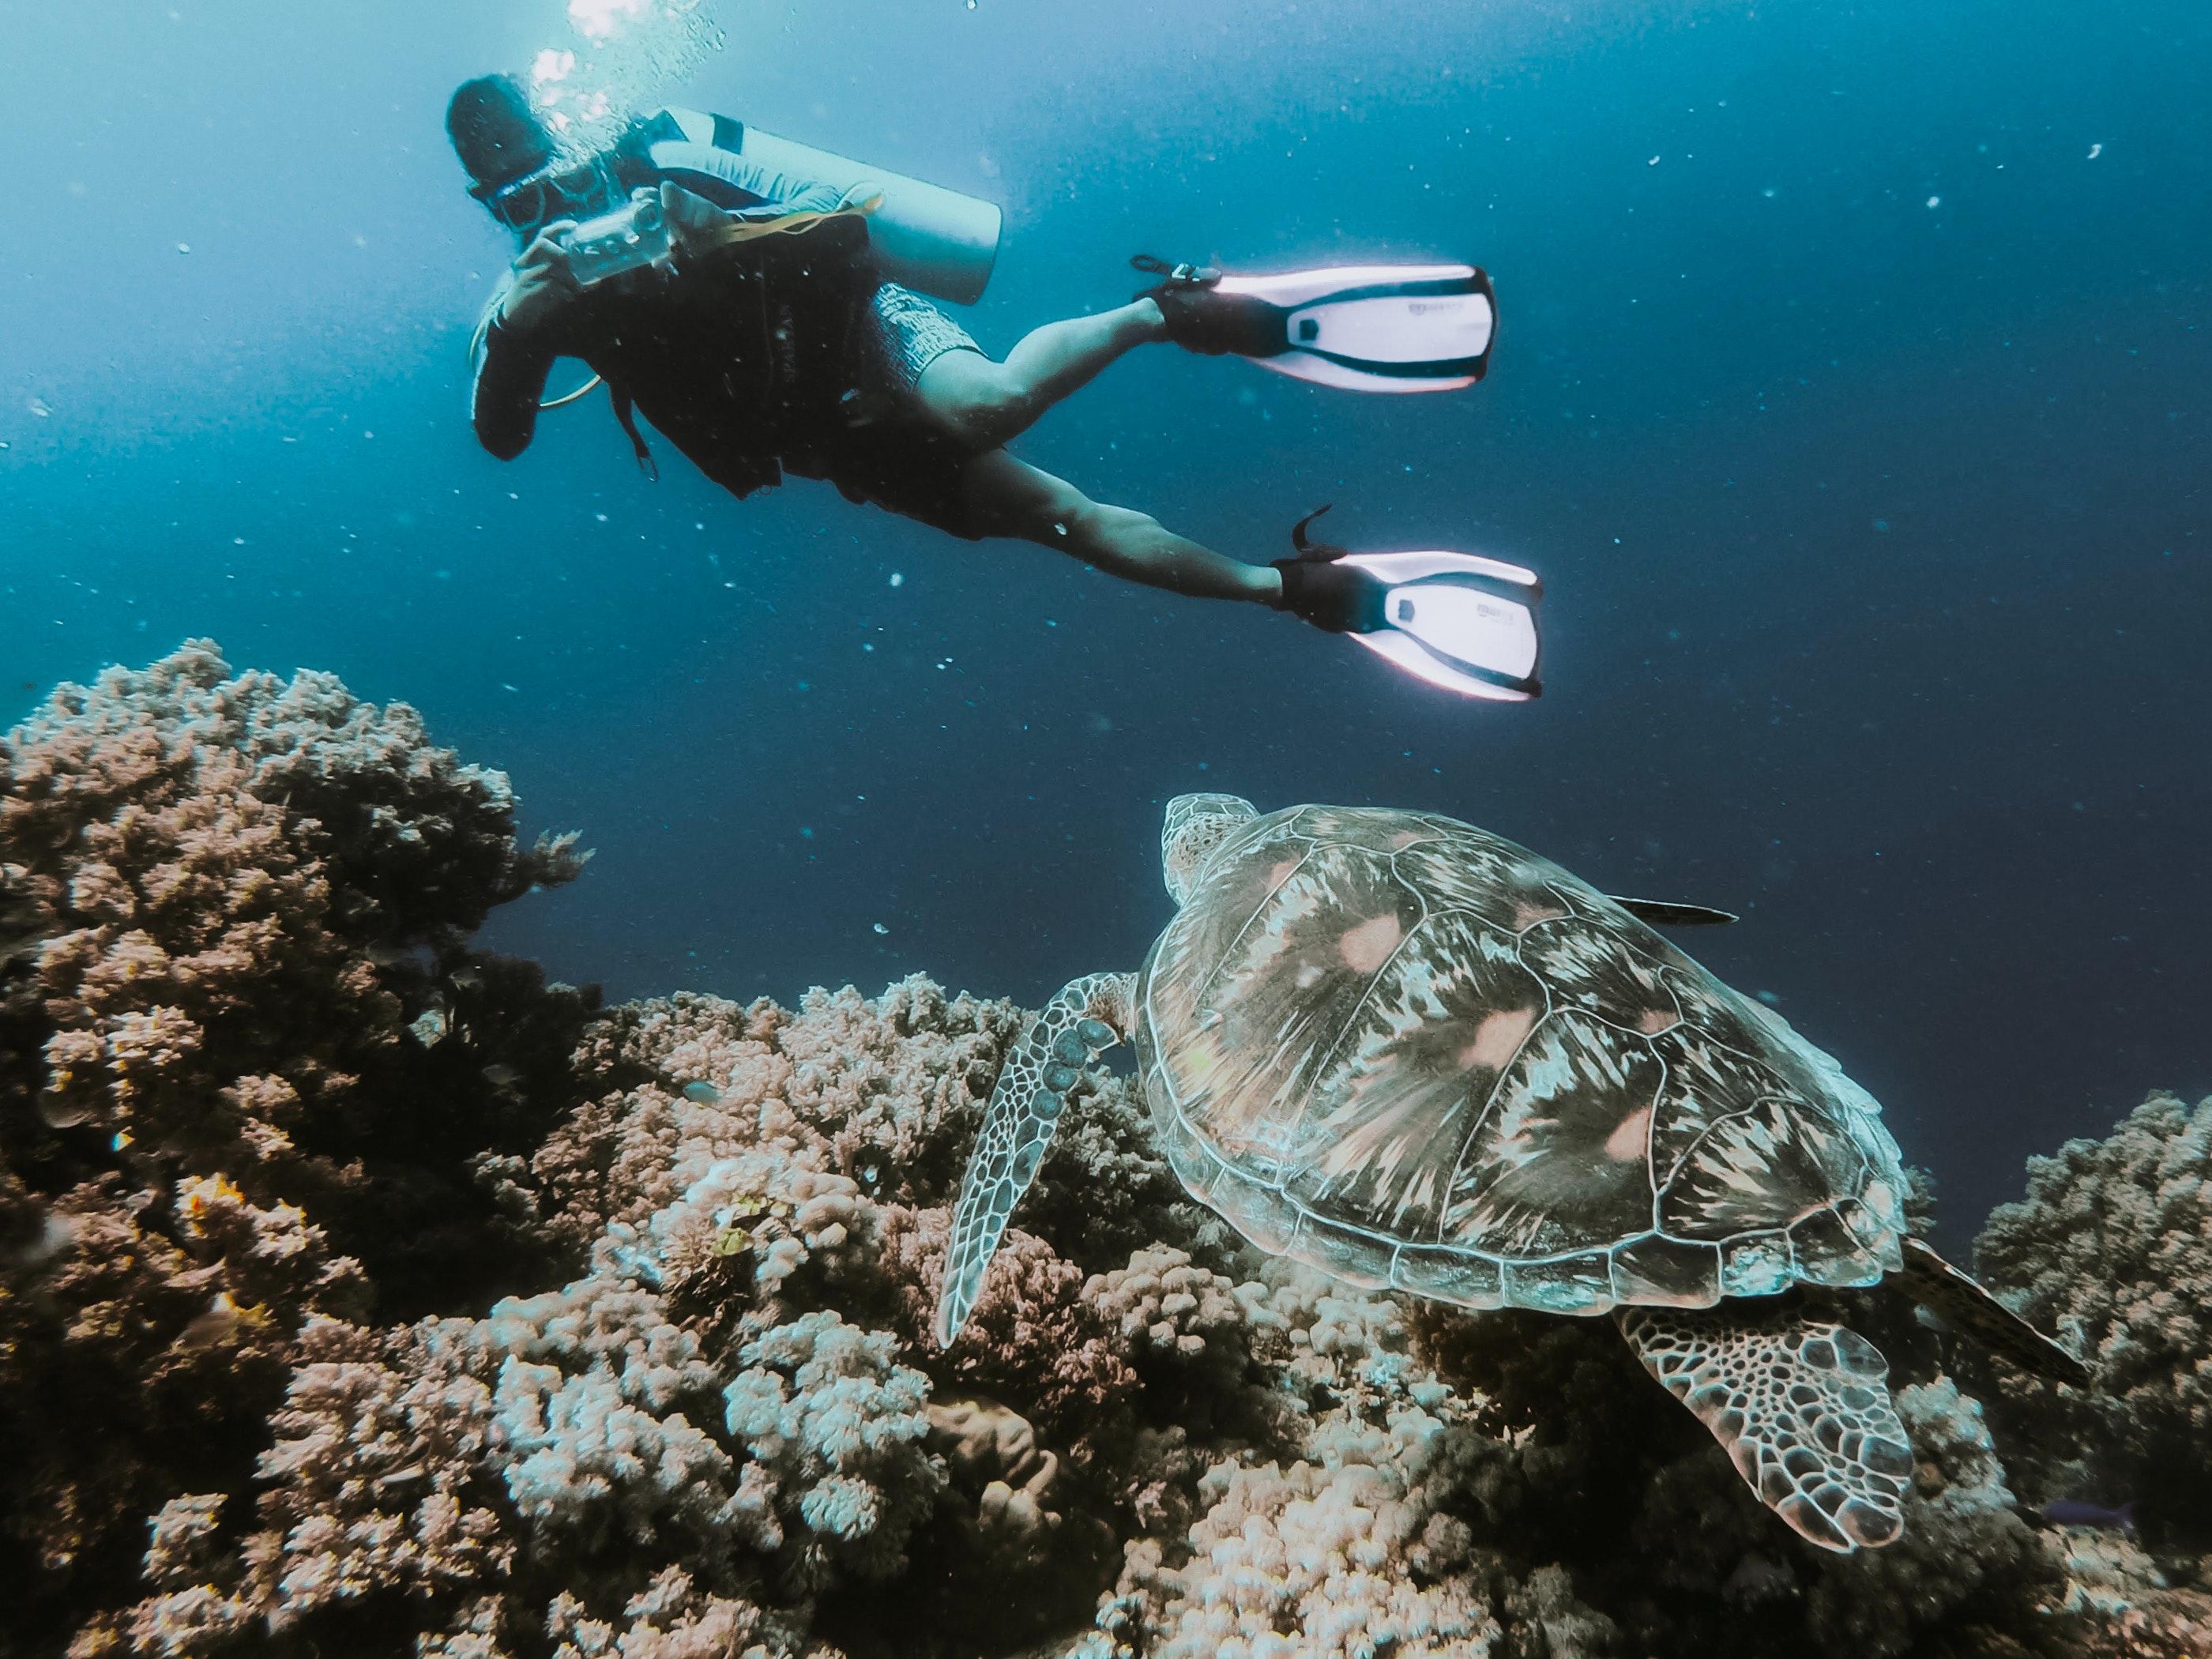 Indulging in Scuba Diving